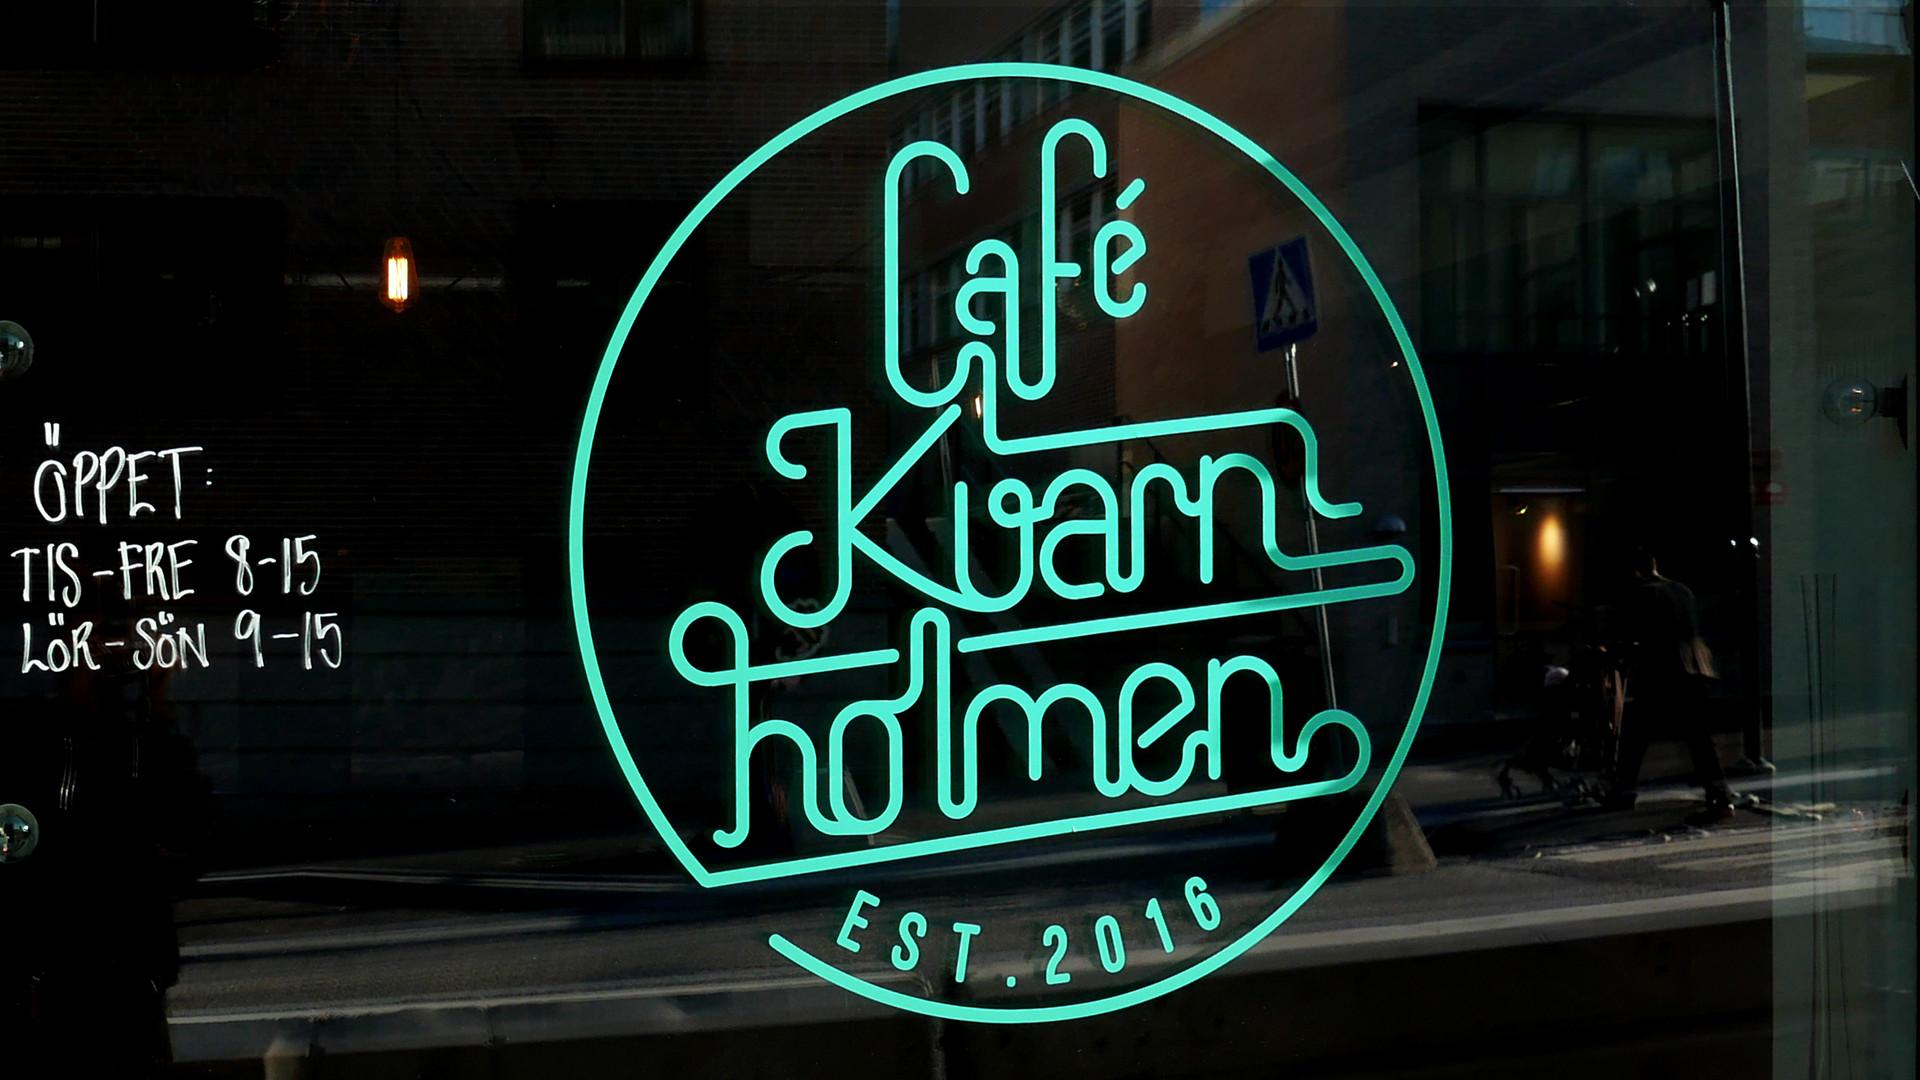 CafeKvarnholmen_skyltfonster.jpg